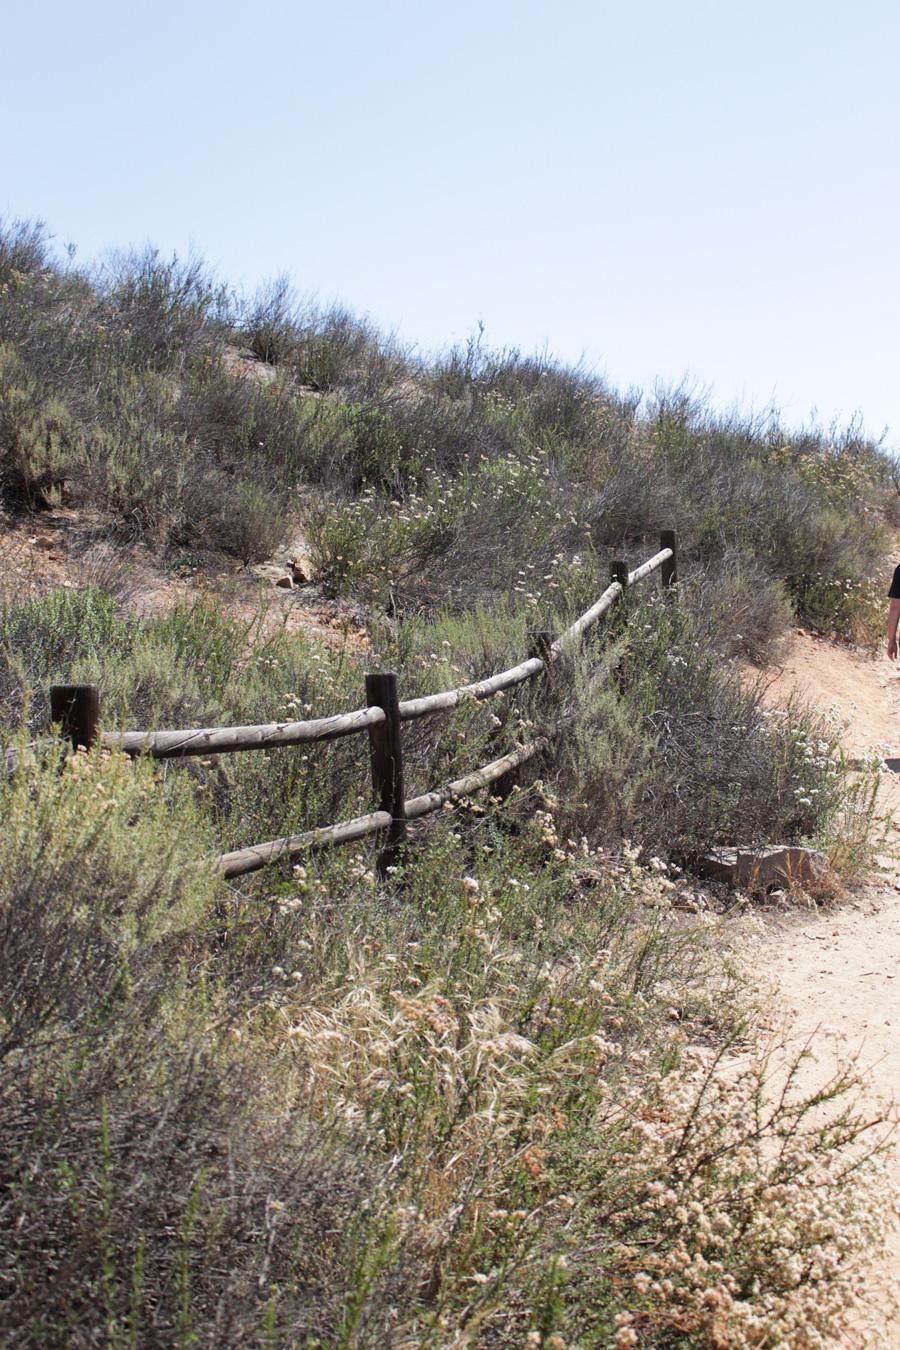 Grassland-Loop-Trail-at-Mission-Trails-Park